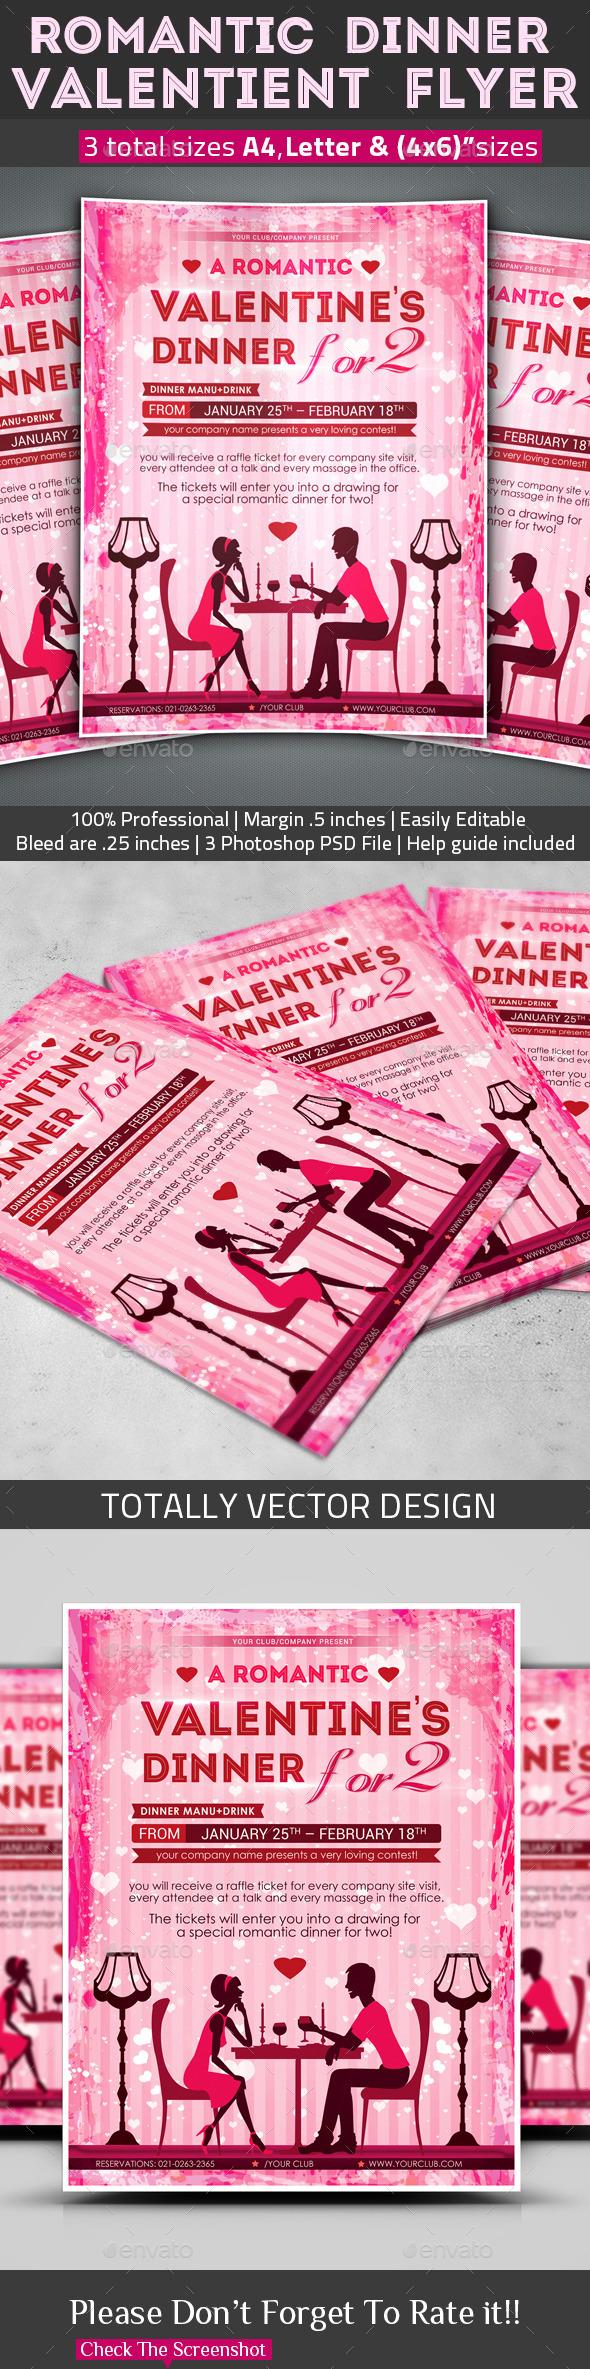 Romantic Dinner  Valentine's Flyer - Restaurant Flyers